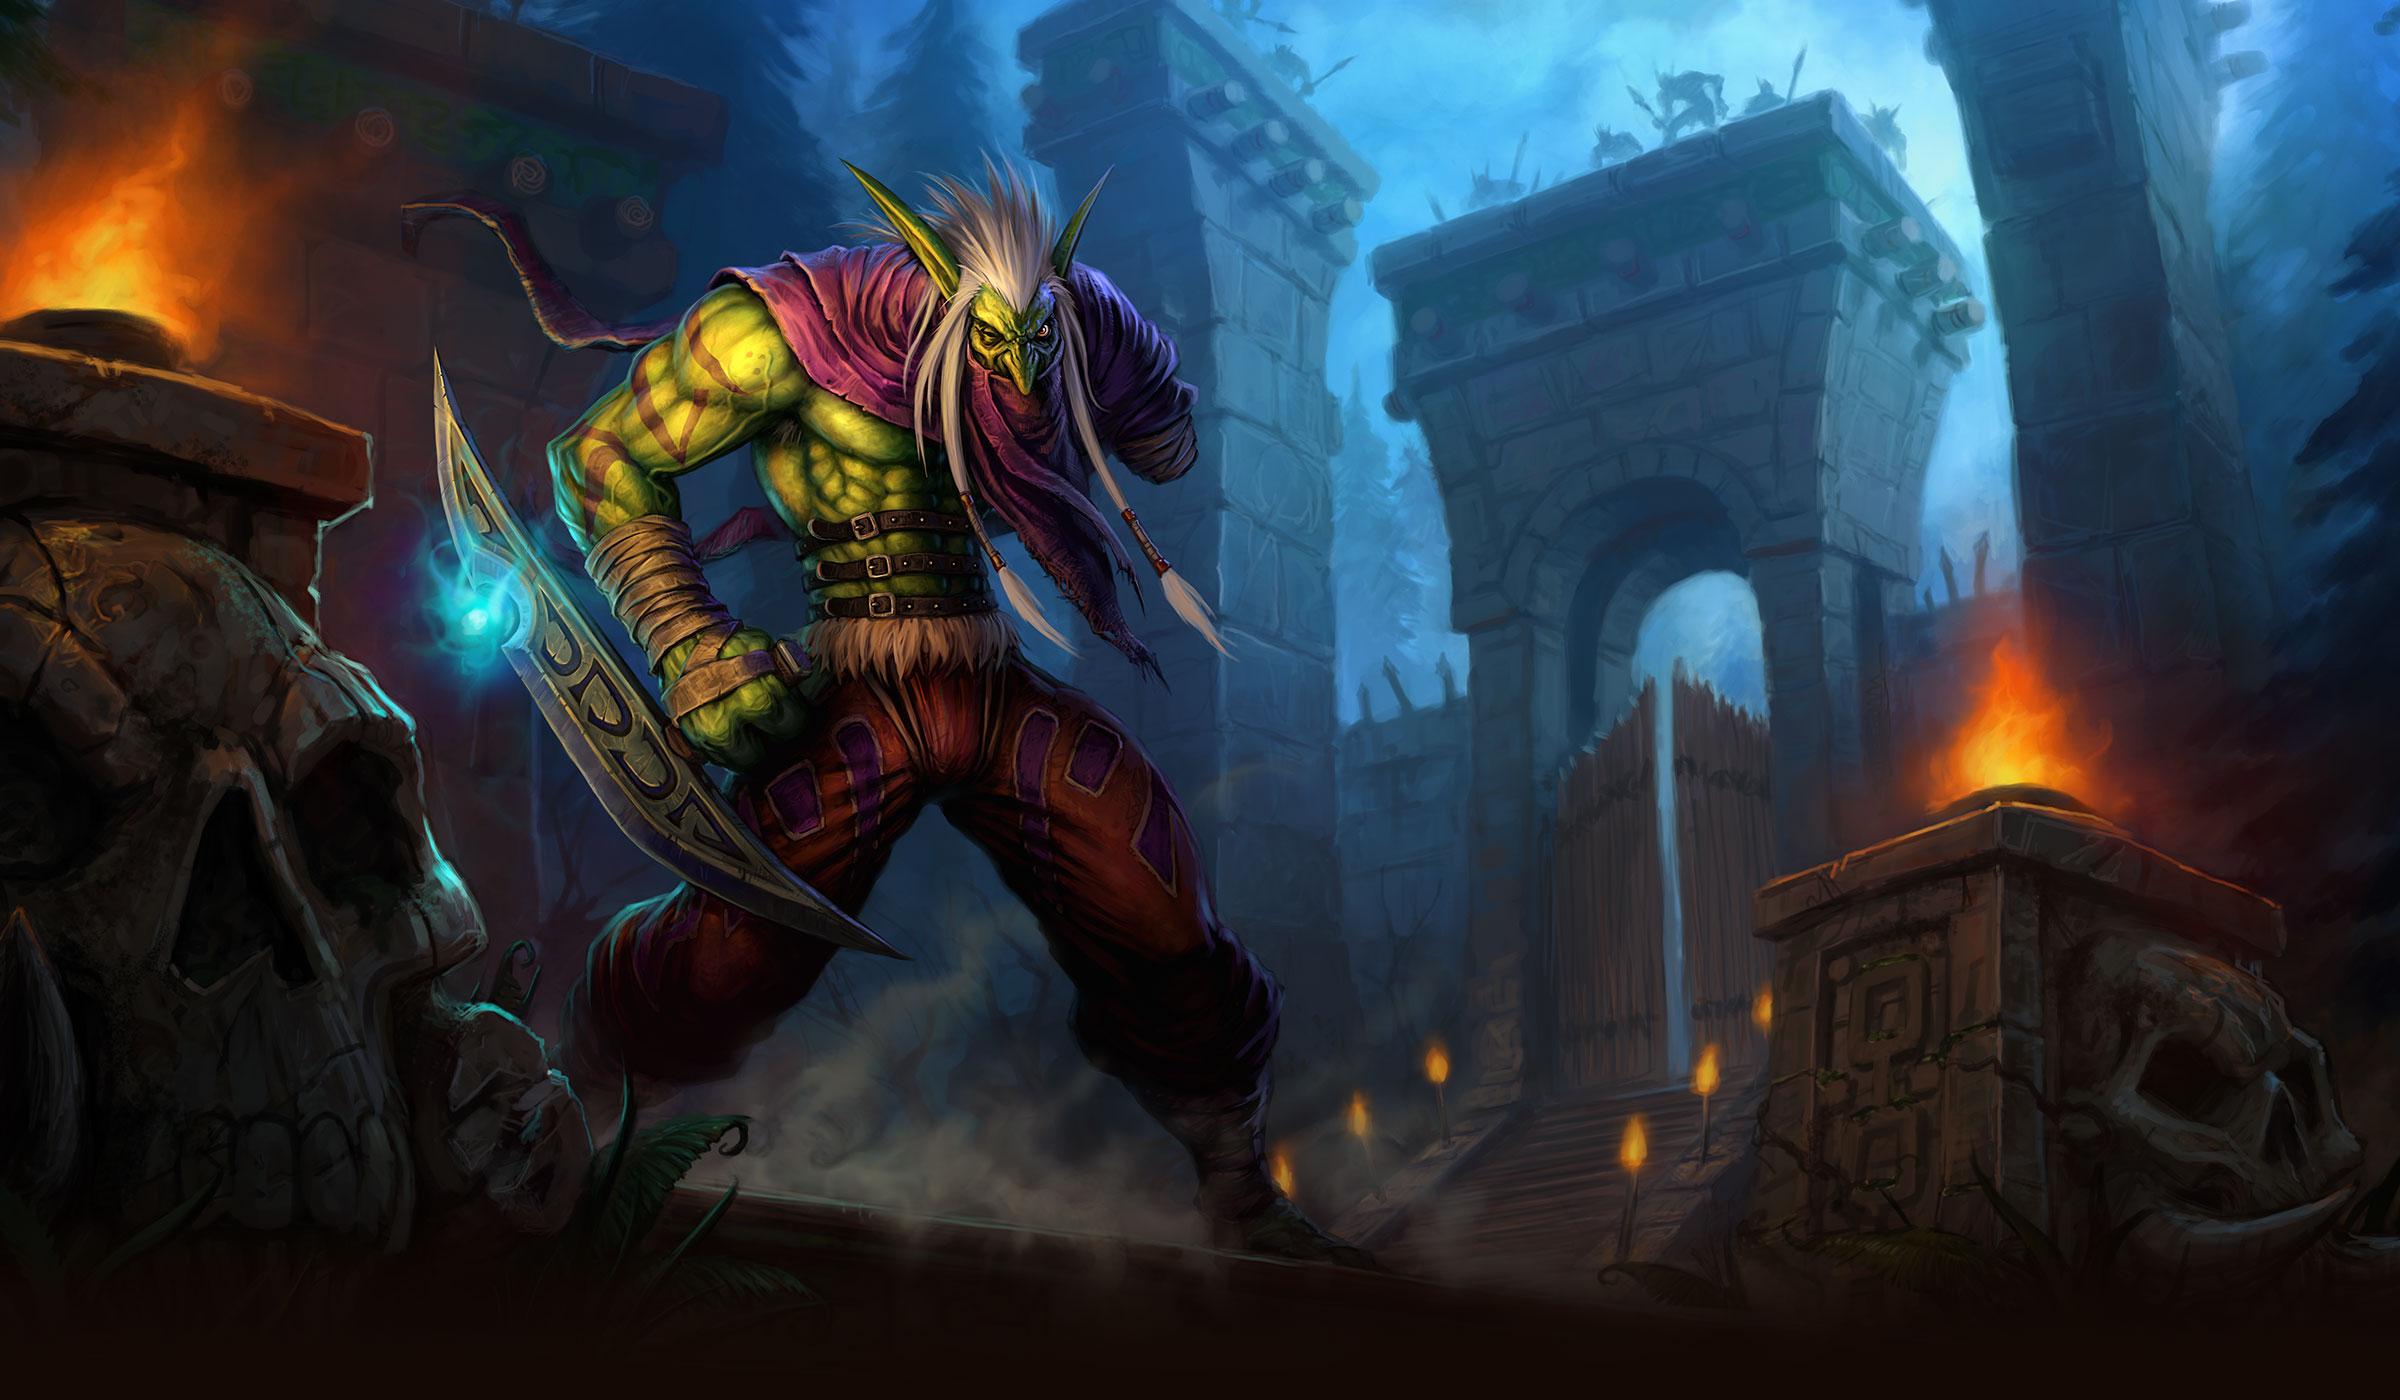 Os Deuses de Zul'Aman Patch 2.3   World of WarCraft, WarCraft, wow, azeroth, lore